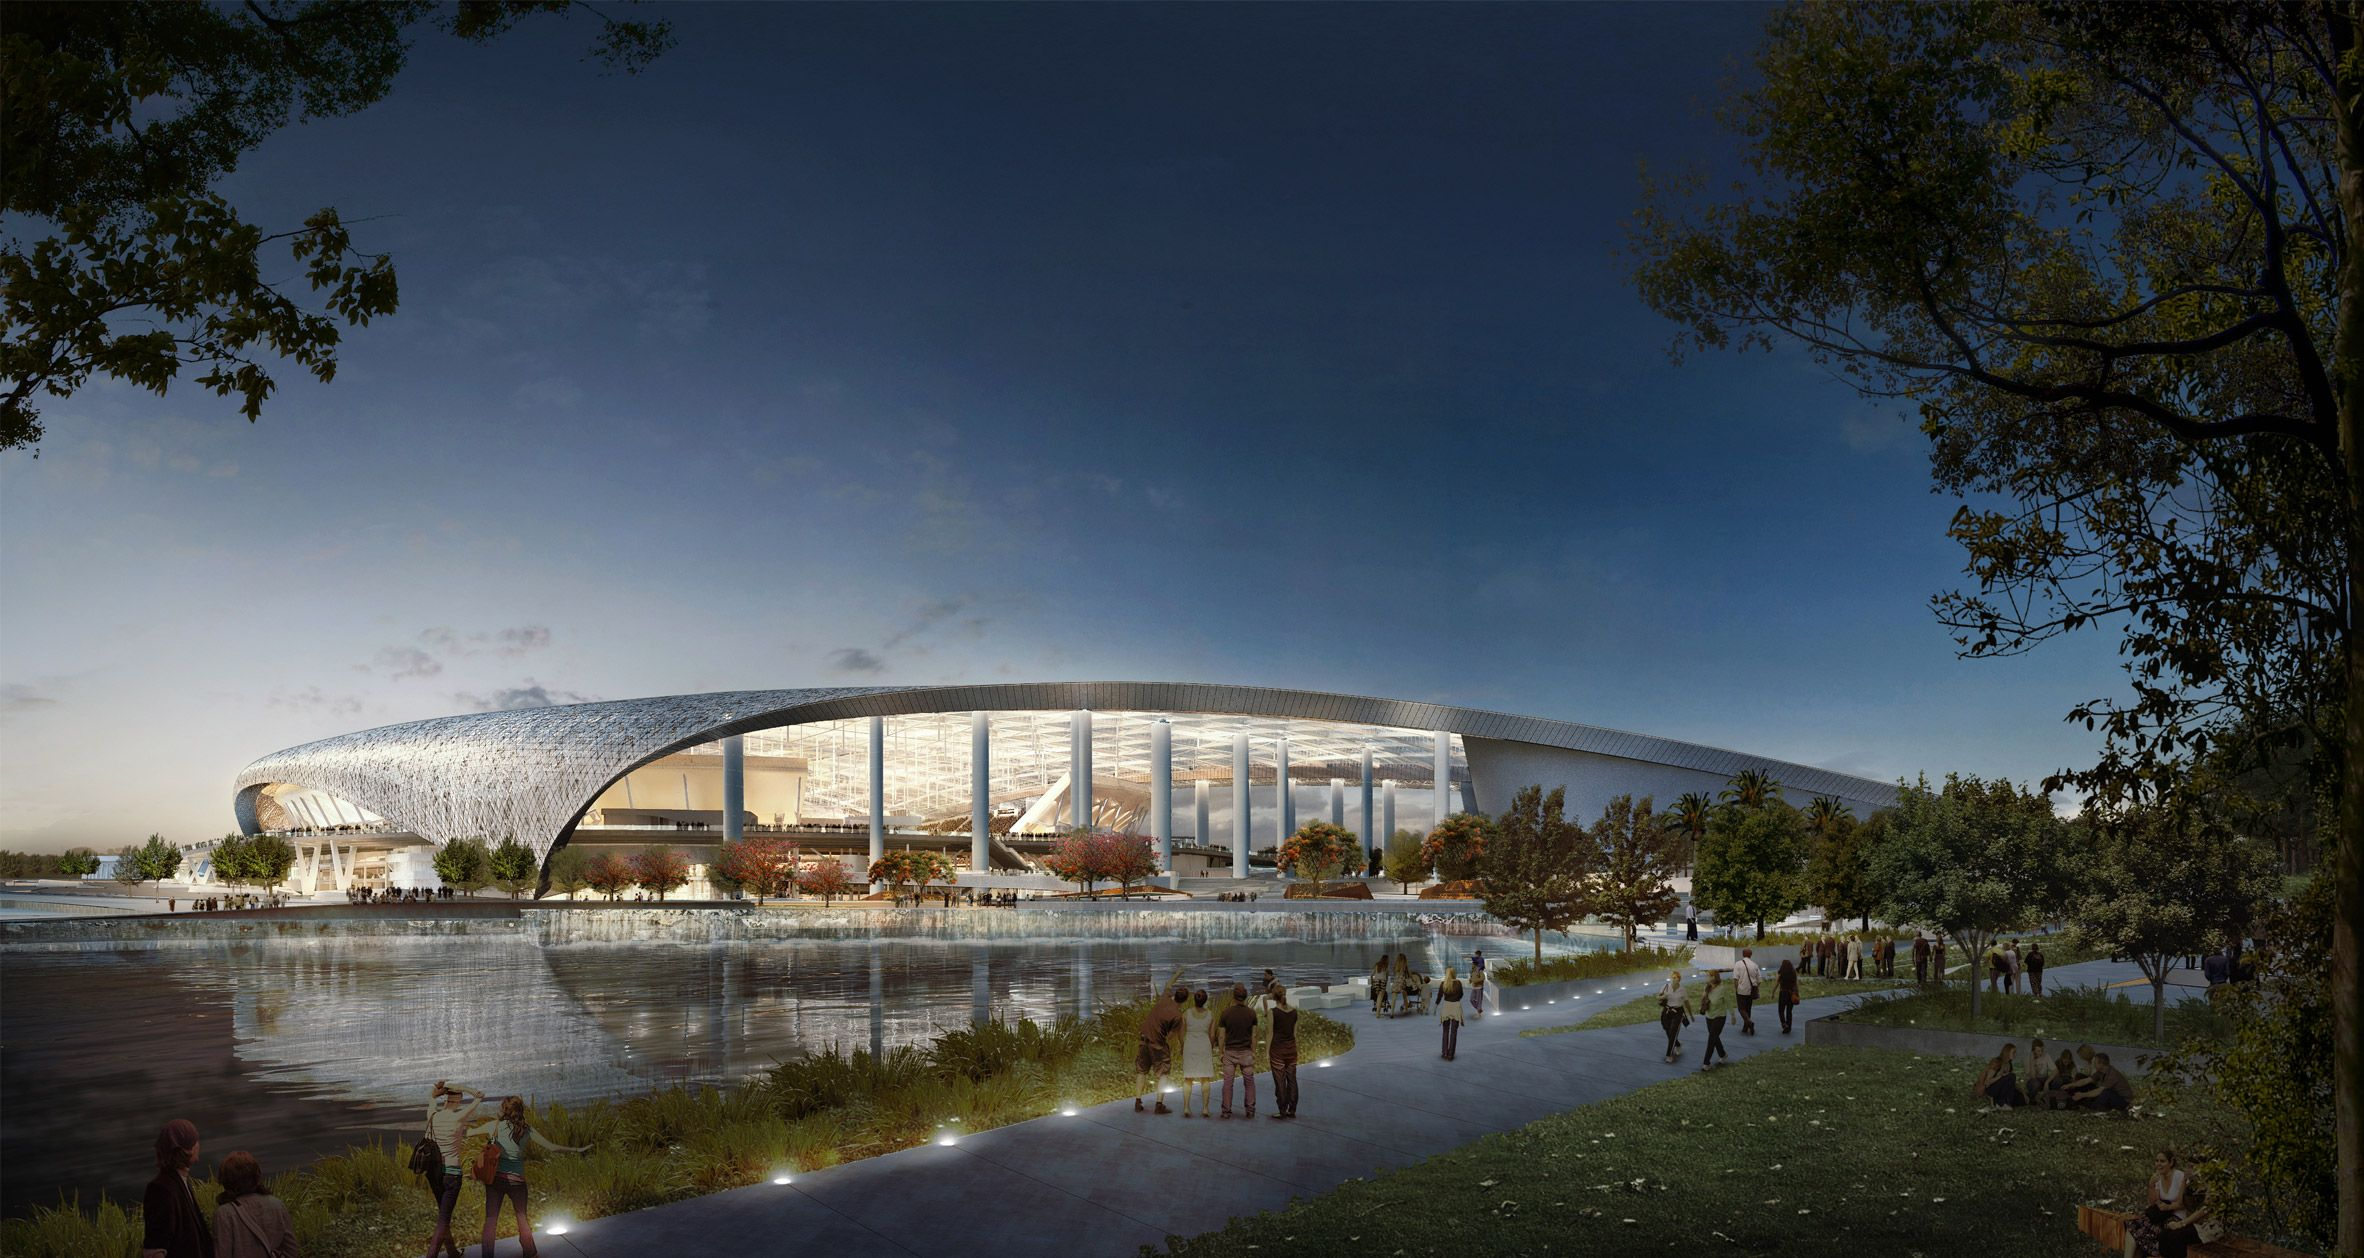 Encompassing Nearly Three Million Square Feet 2 7 Million Square Metres This Sports Arena Is Now Under Constru Stadium Architecture Stadium Los Angeles Rams